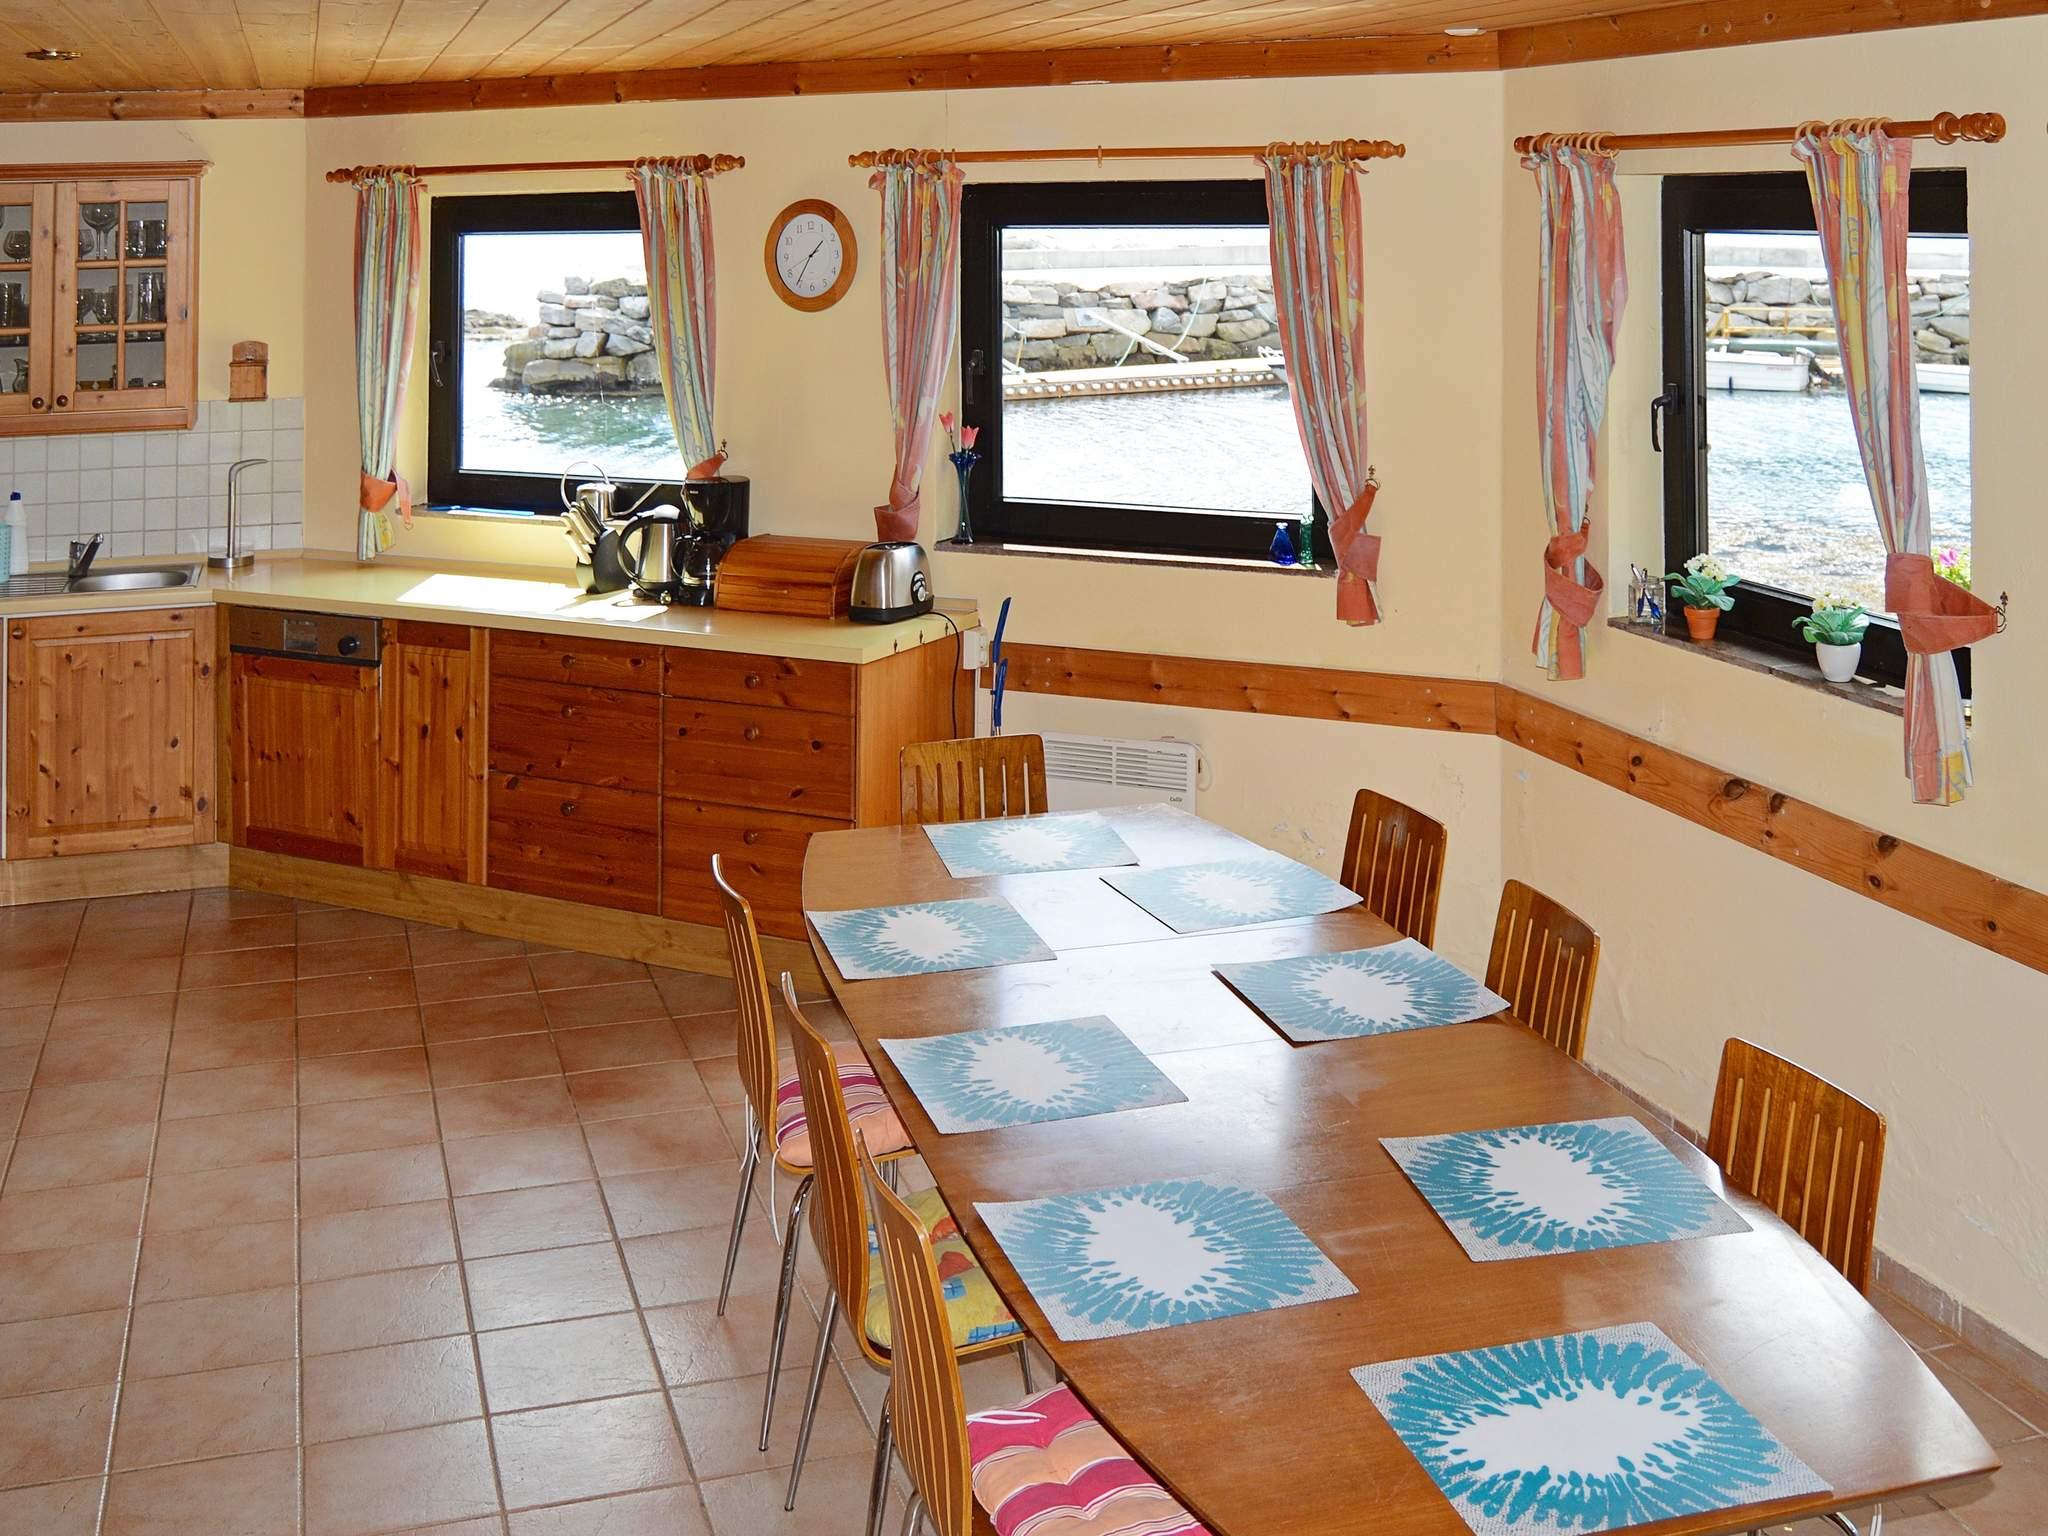 Ferienhaus Eidsvåg (84695), Eidsvåg, More - Romsdal, Westnorwegen, Norwegen, Bild 10